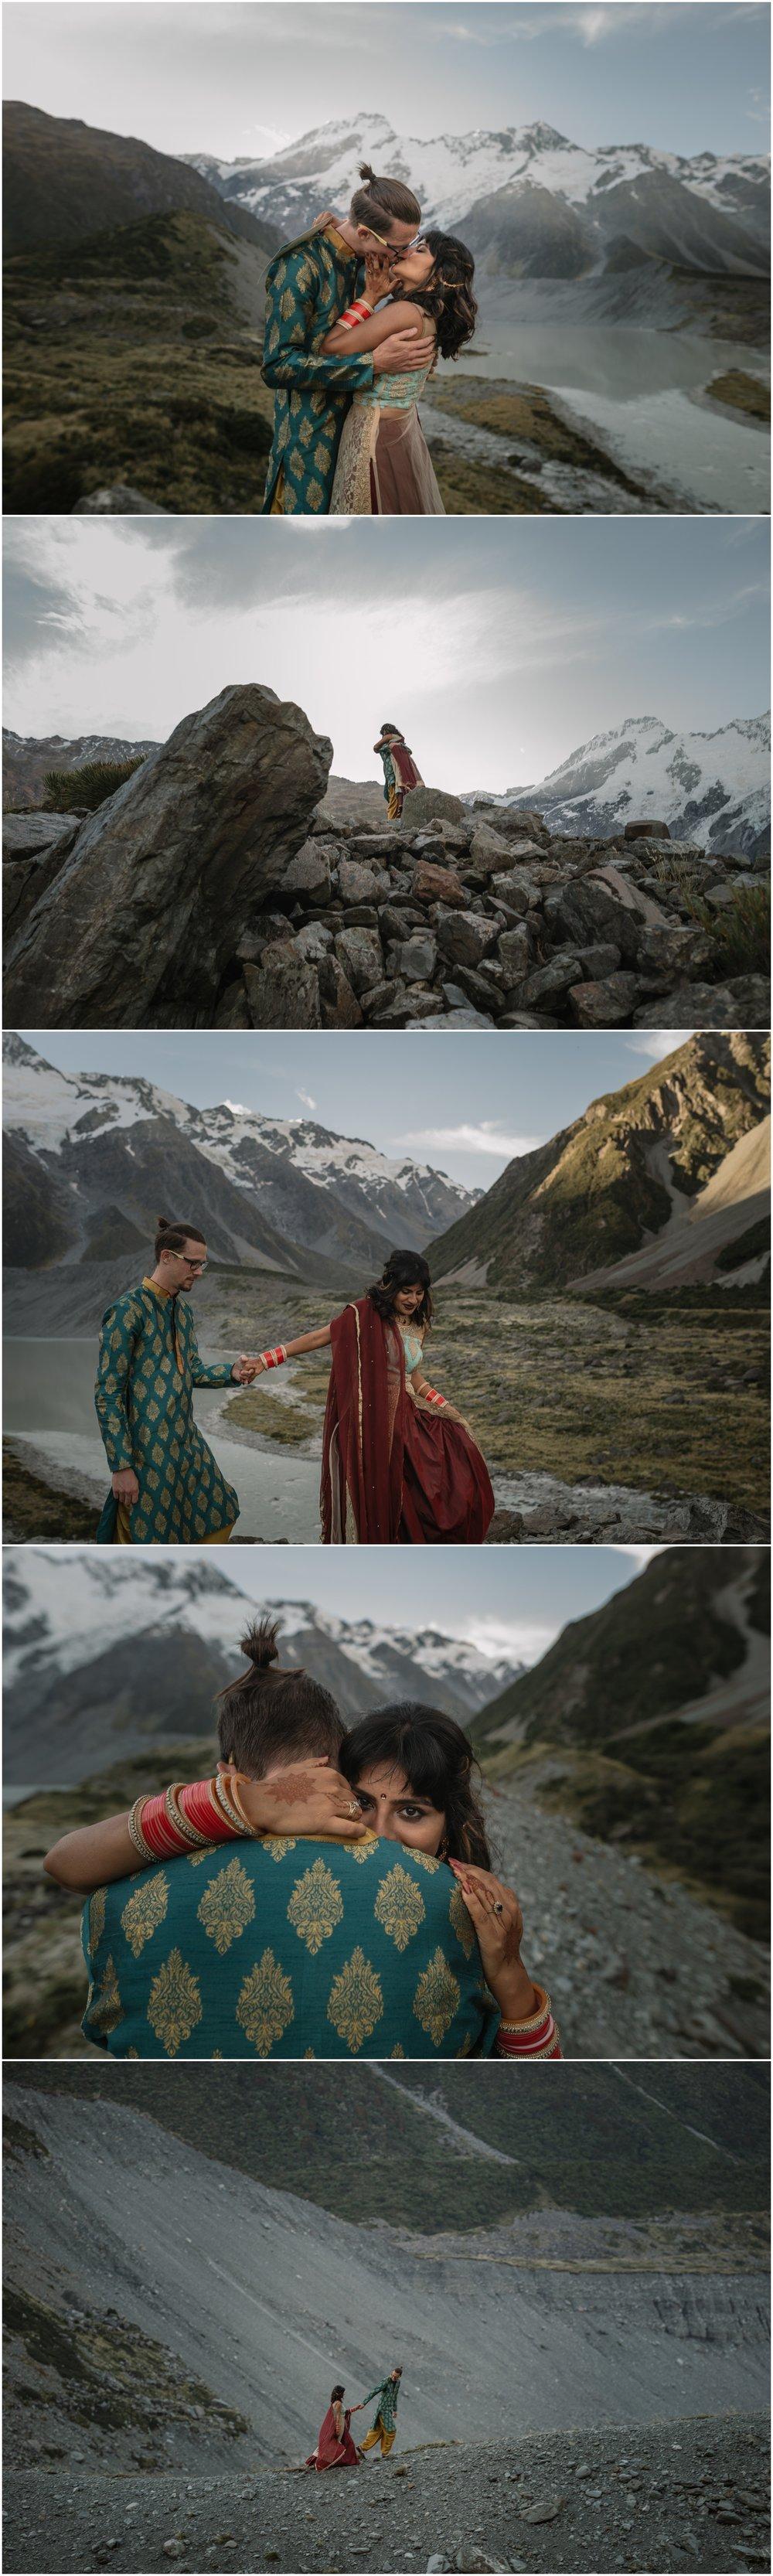 Punjabi elopement New Zealand - Sirjana & Ben 018.JPG